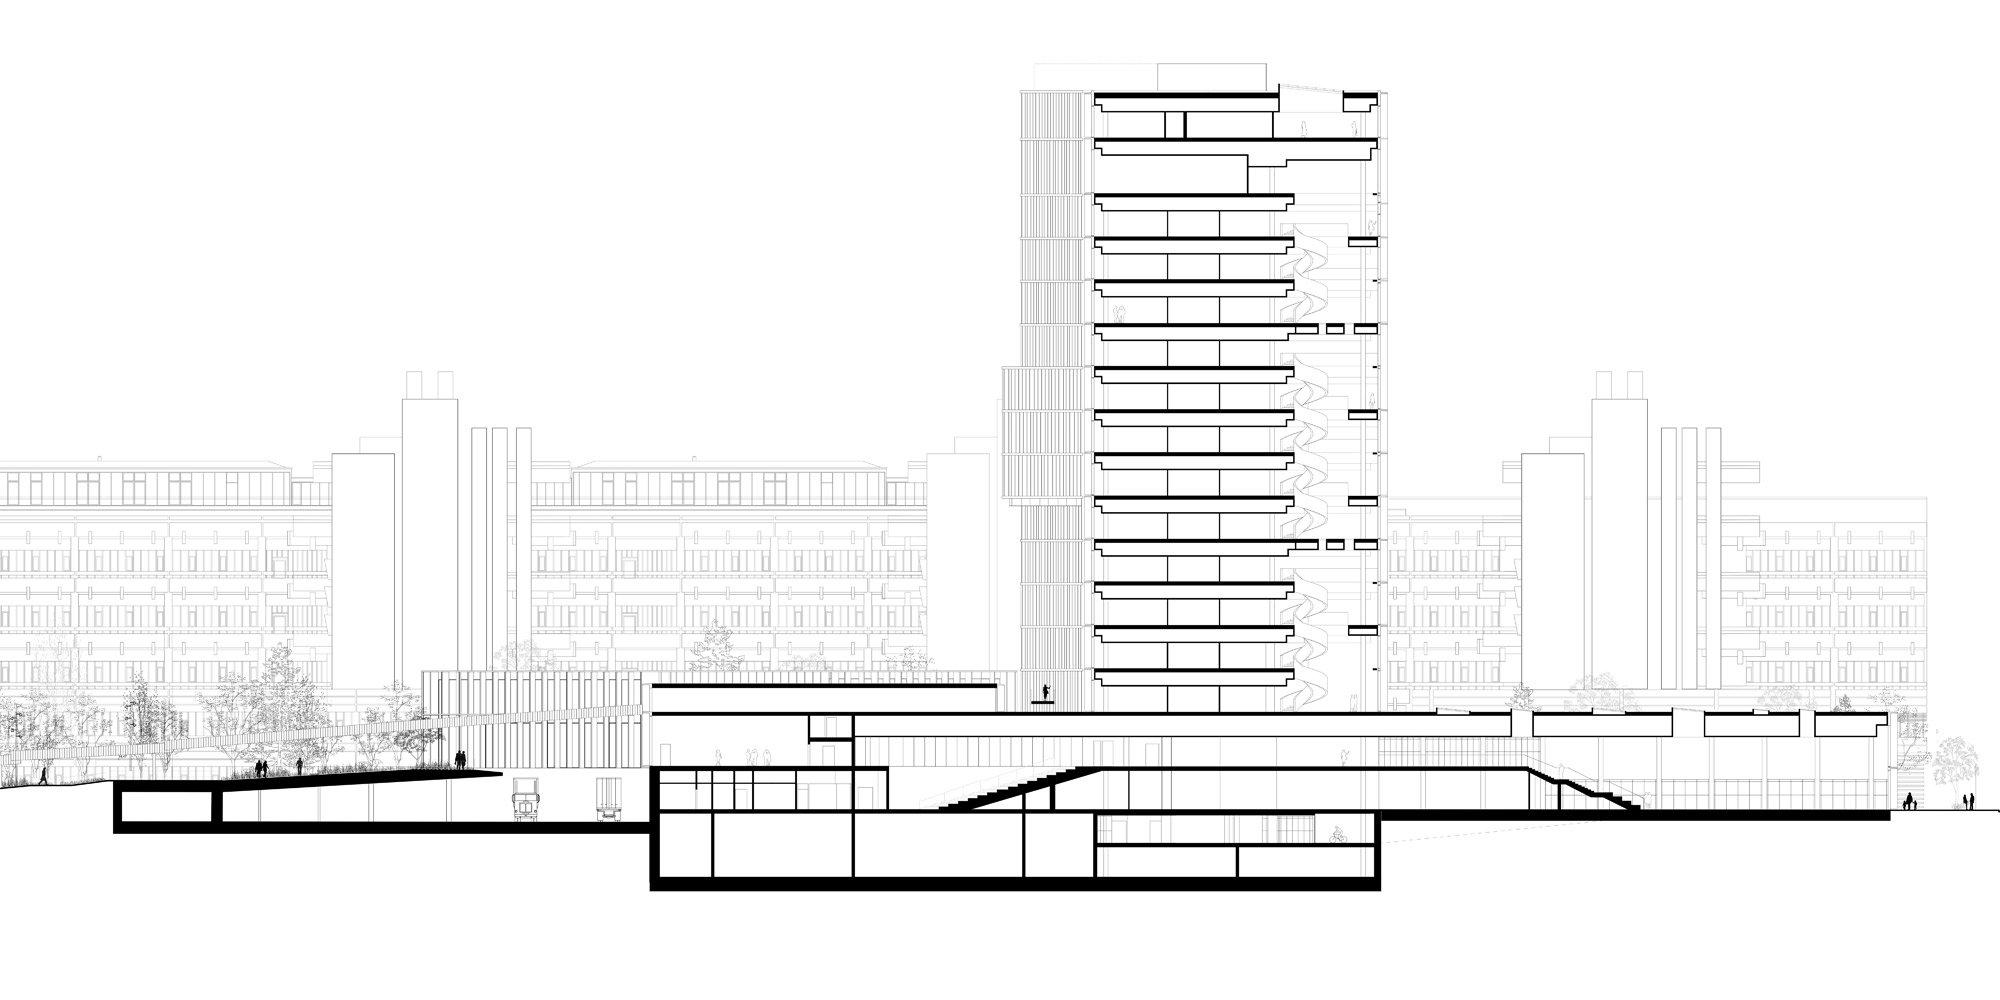 Sezione AA © C.F. Møller Architects